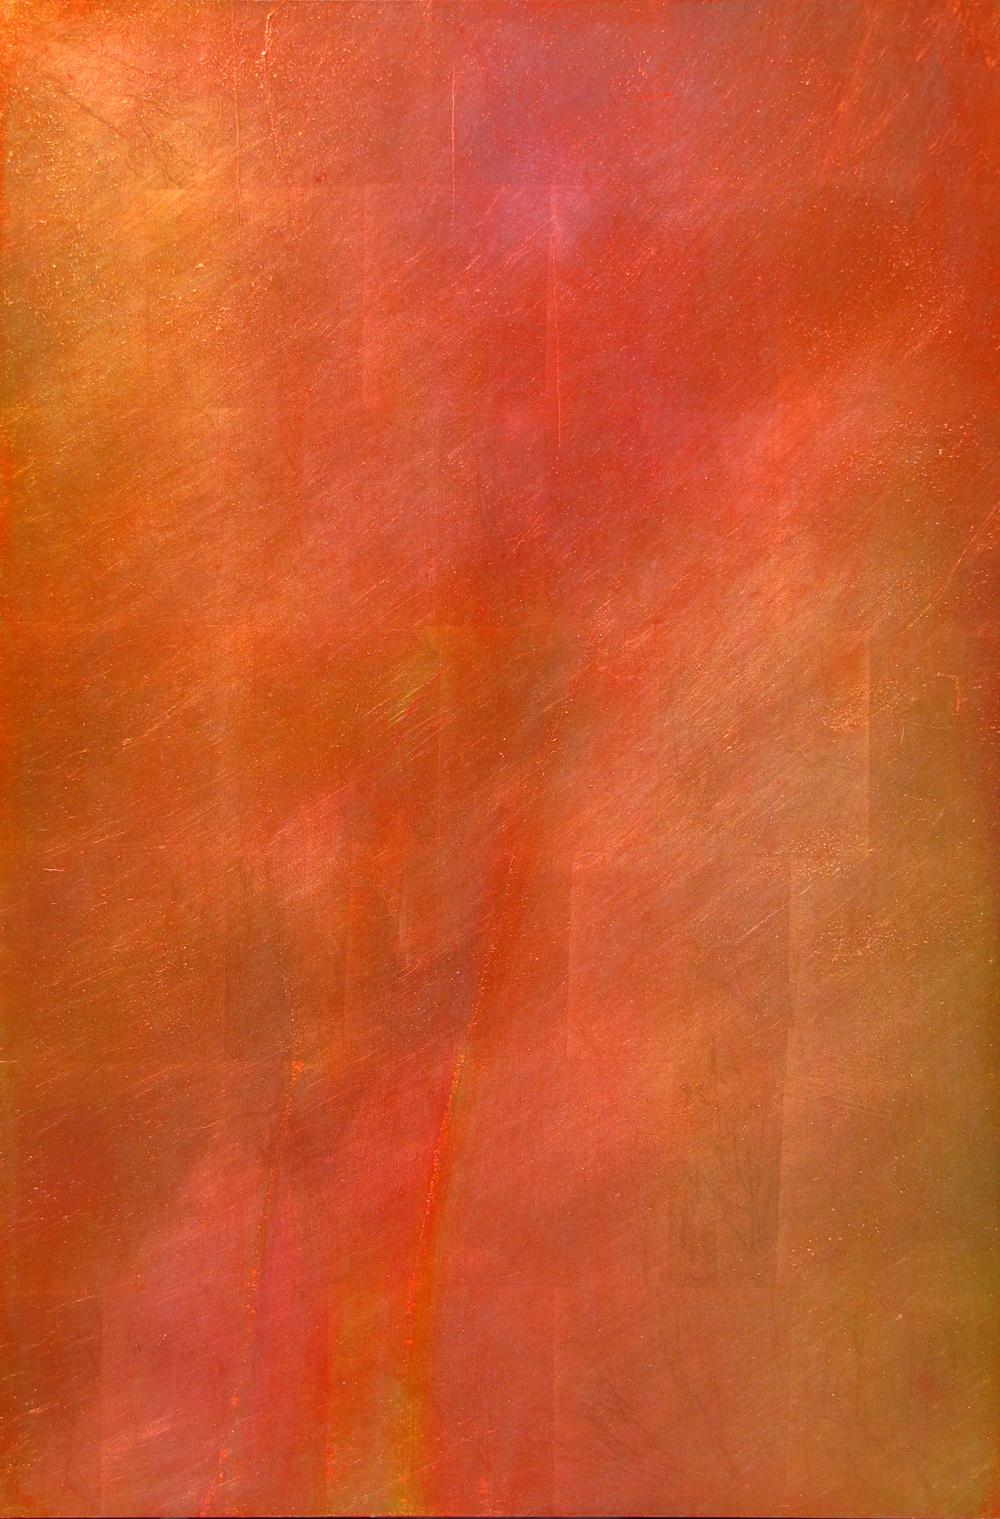 "TRUMPET VINE FLOWER 24"" x 36"" — Oil over aluminum silver leaf on panel $3000.00"